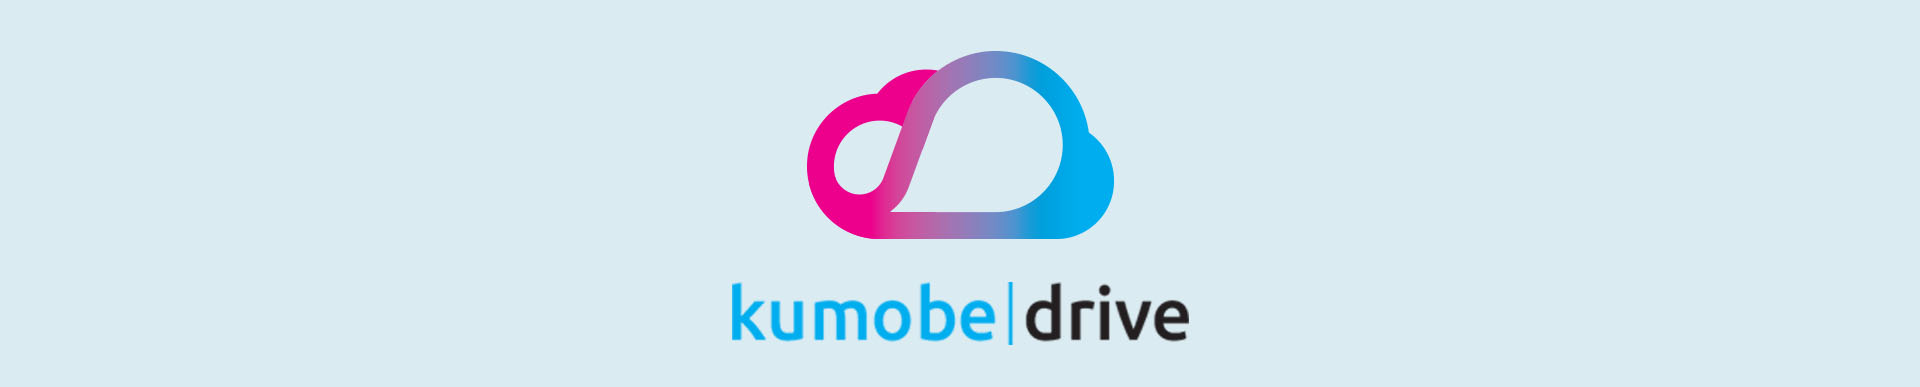 nube_abajo_kumobedrive